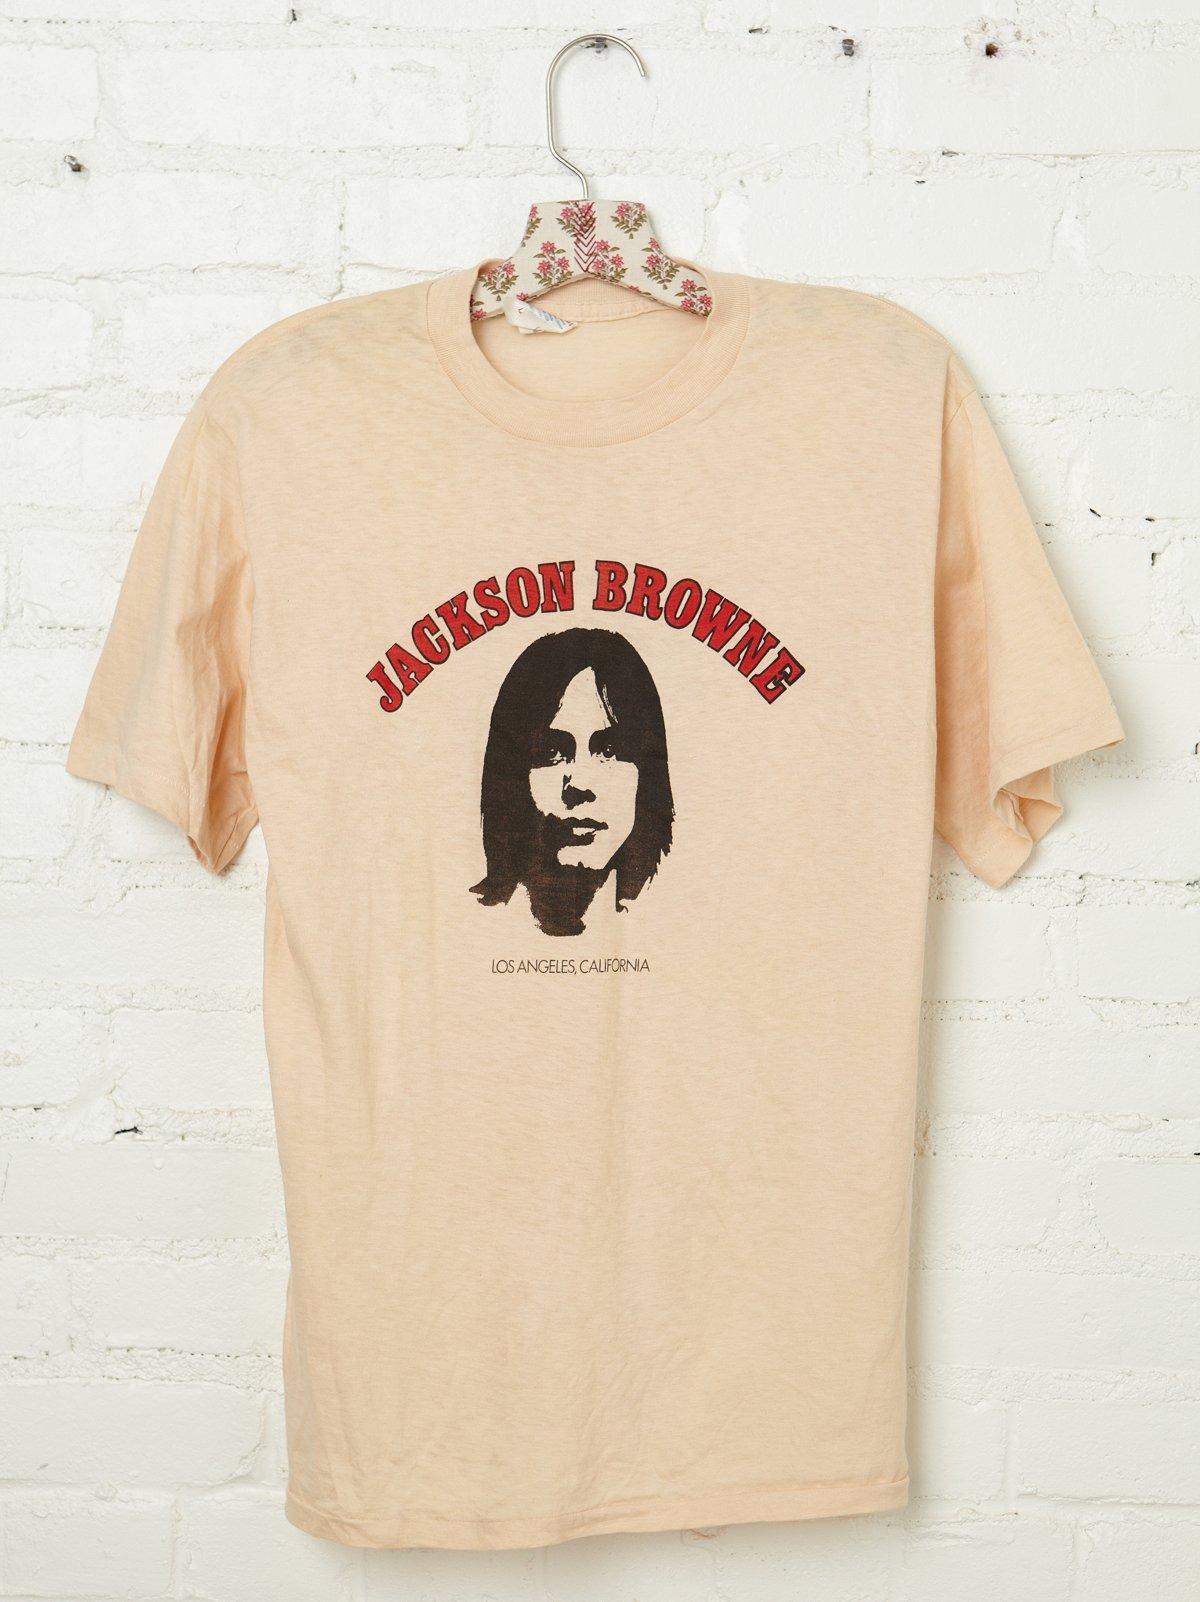 Vintage Jackson Browne Tee